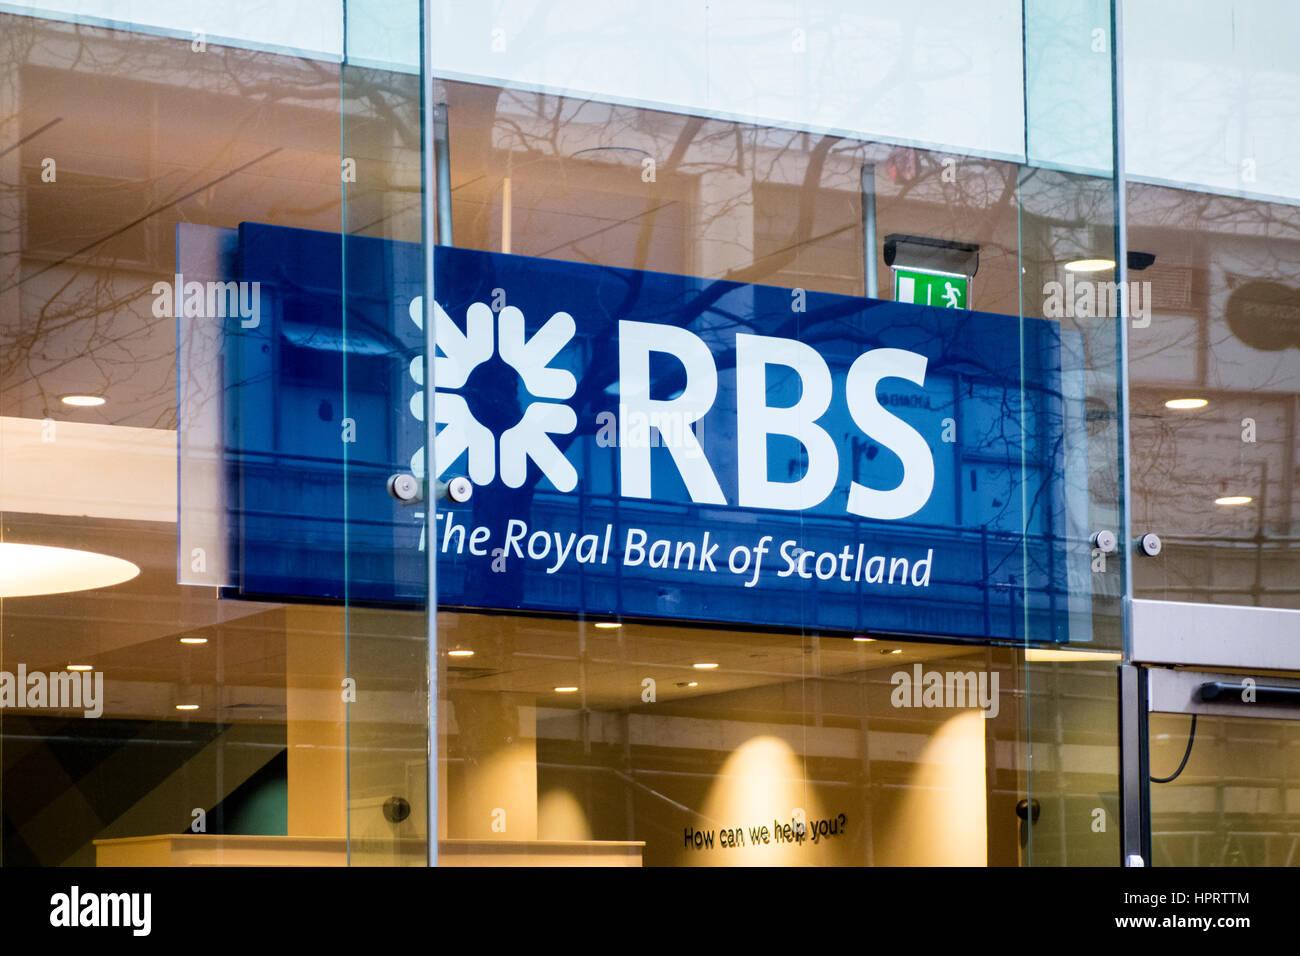 RBS Royal Bank of Scotland Filiale Zeichen logo, Birmingham, Großbritannien Stockbild